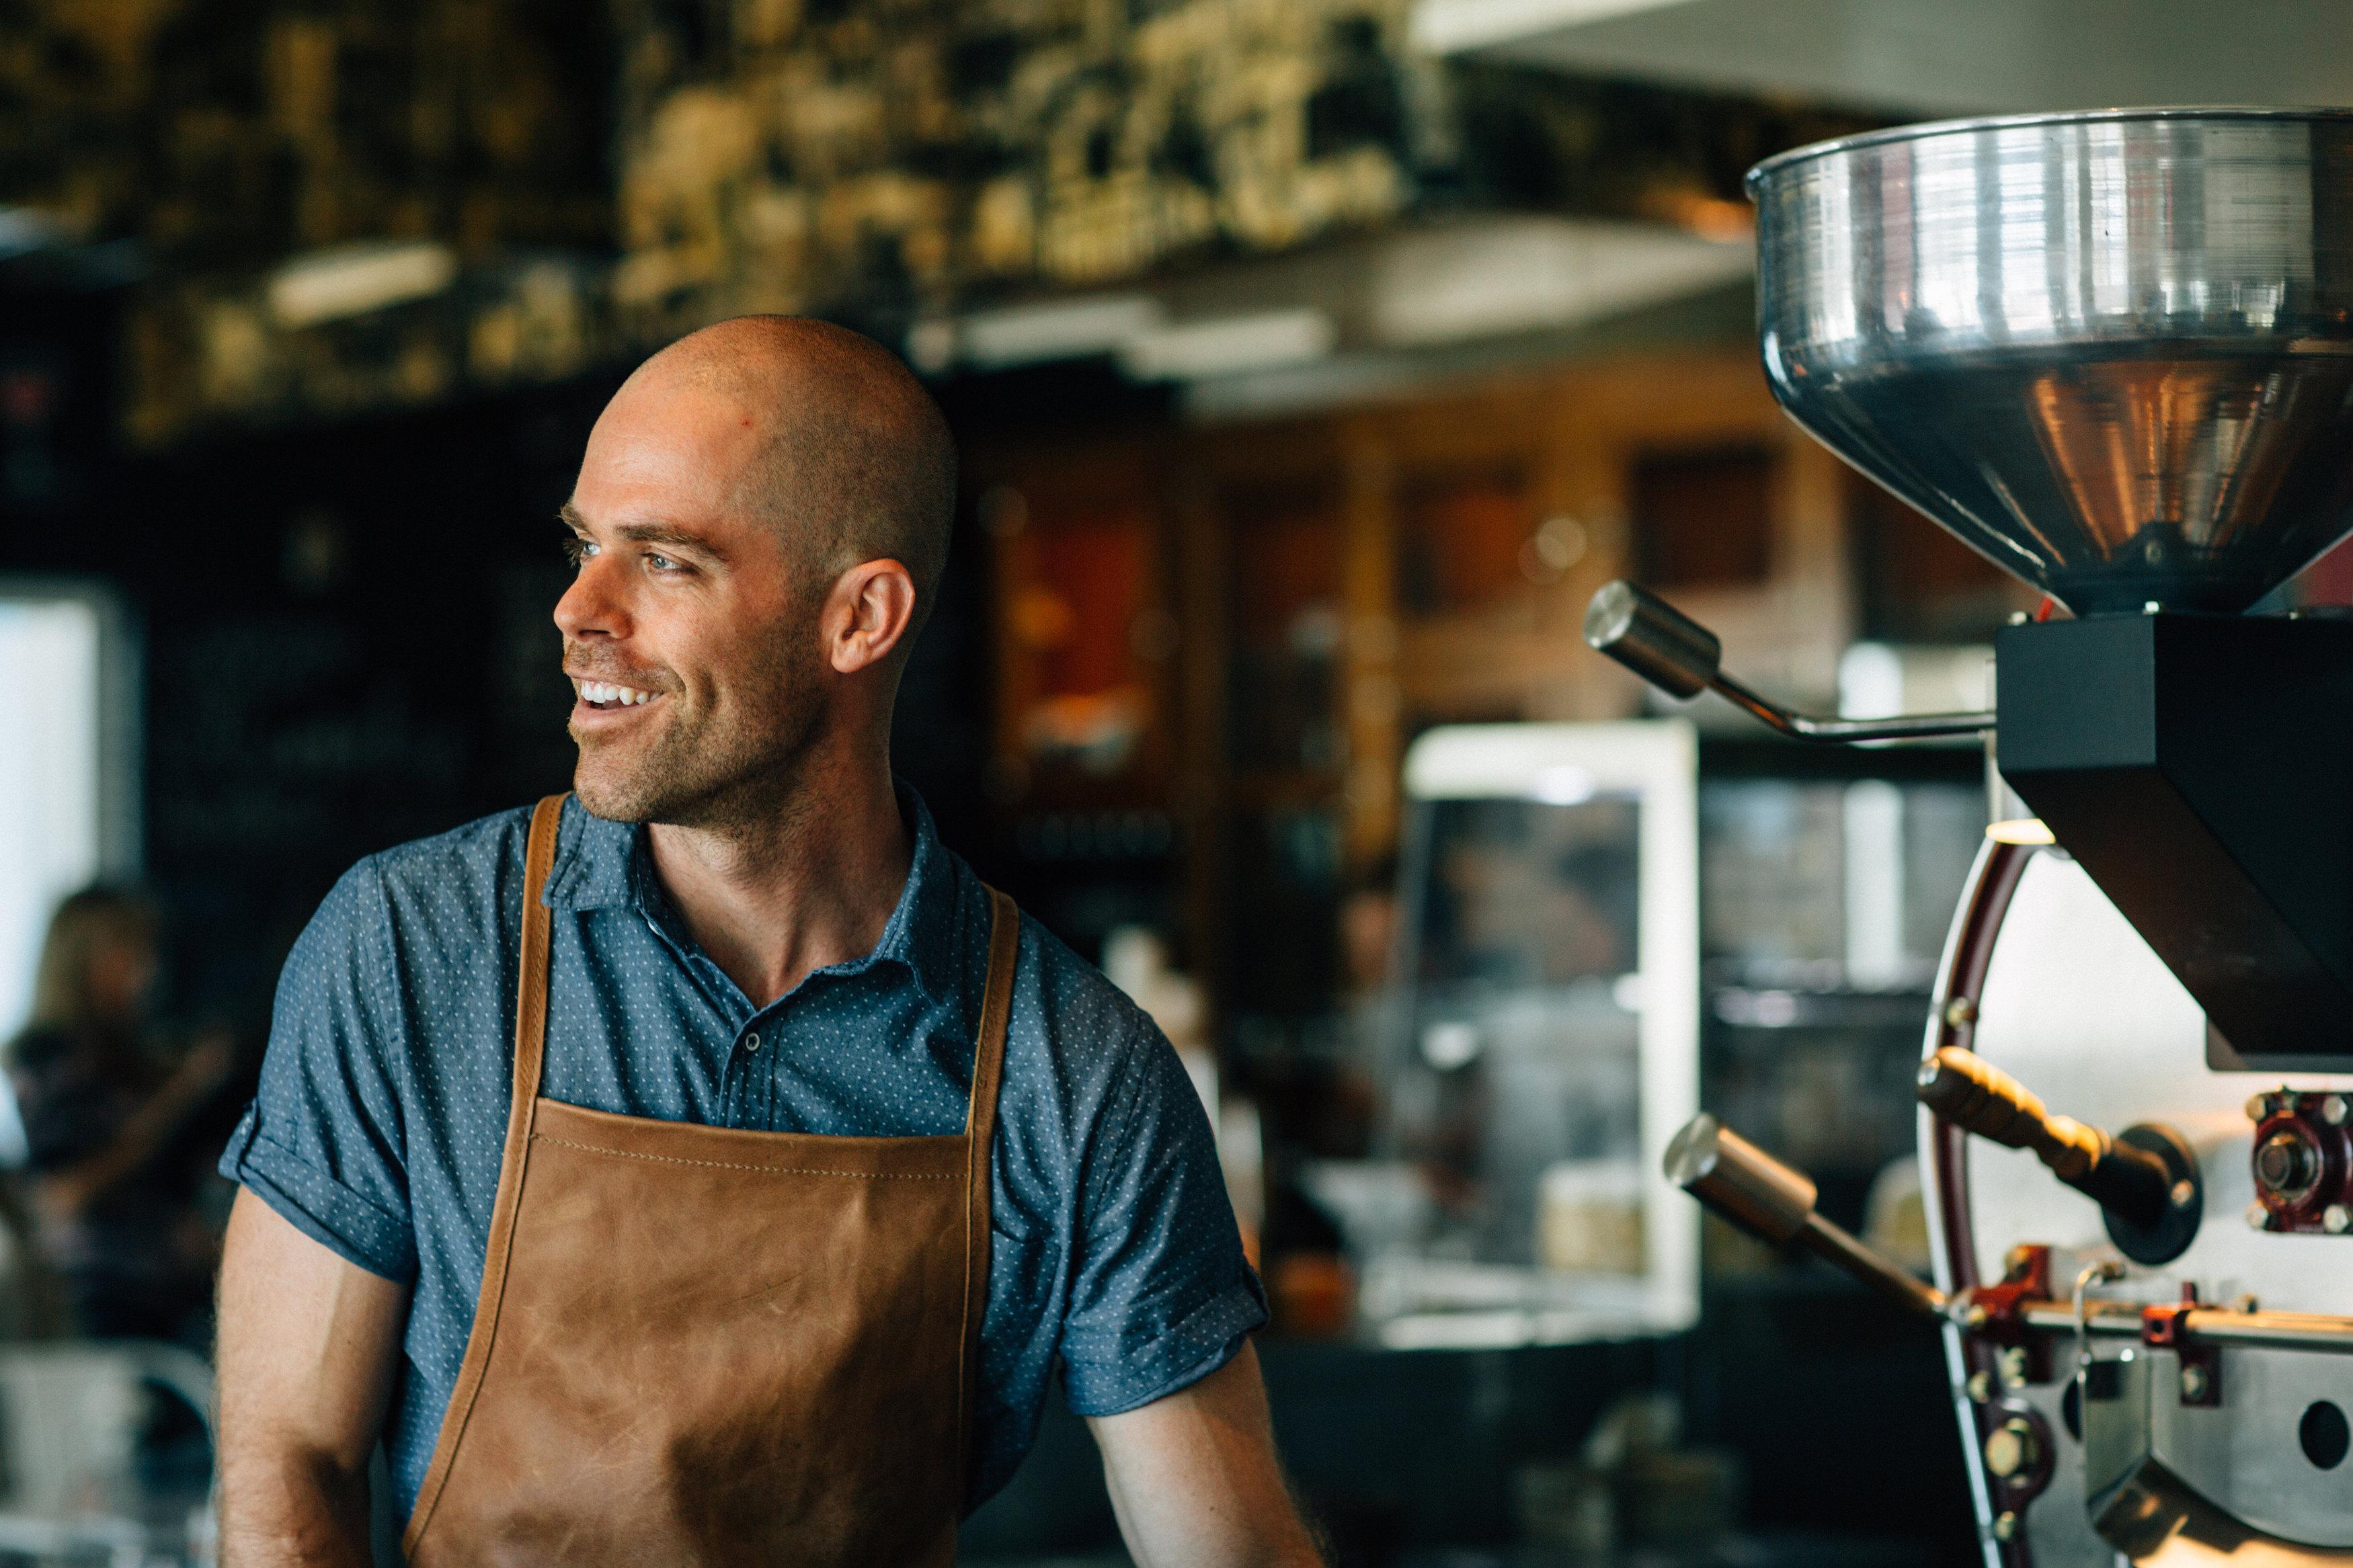 Sean Scott making coffee